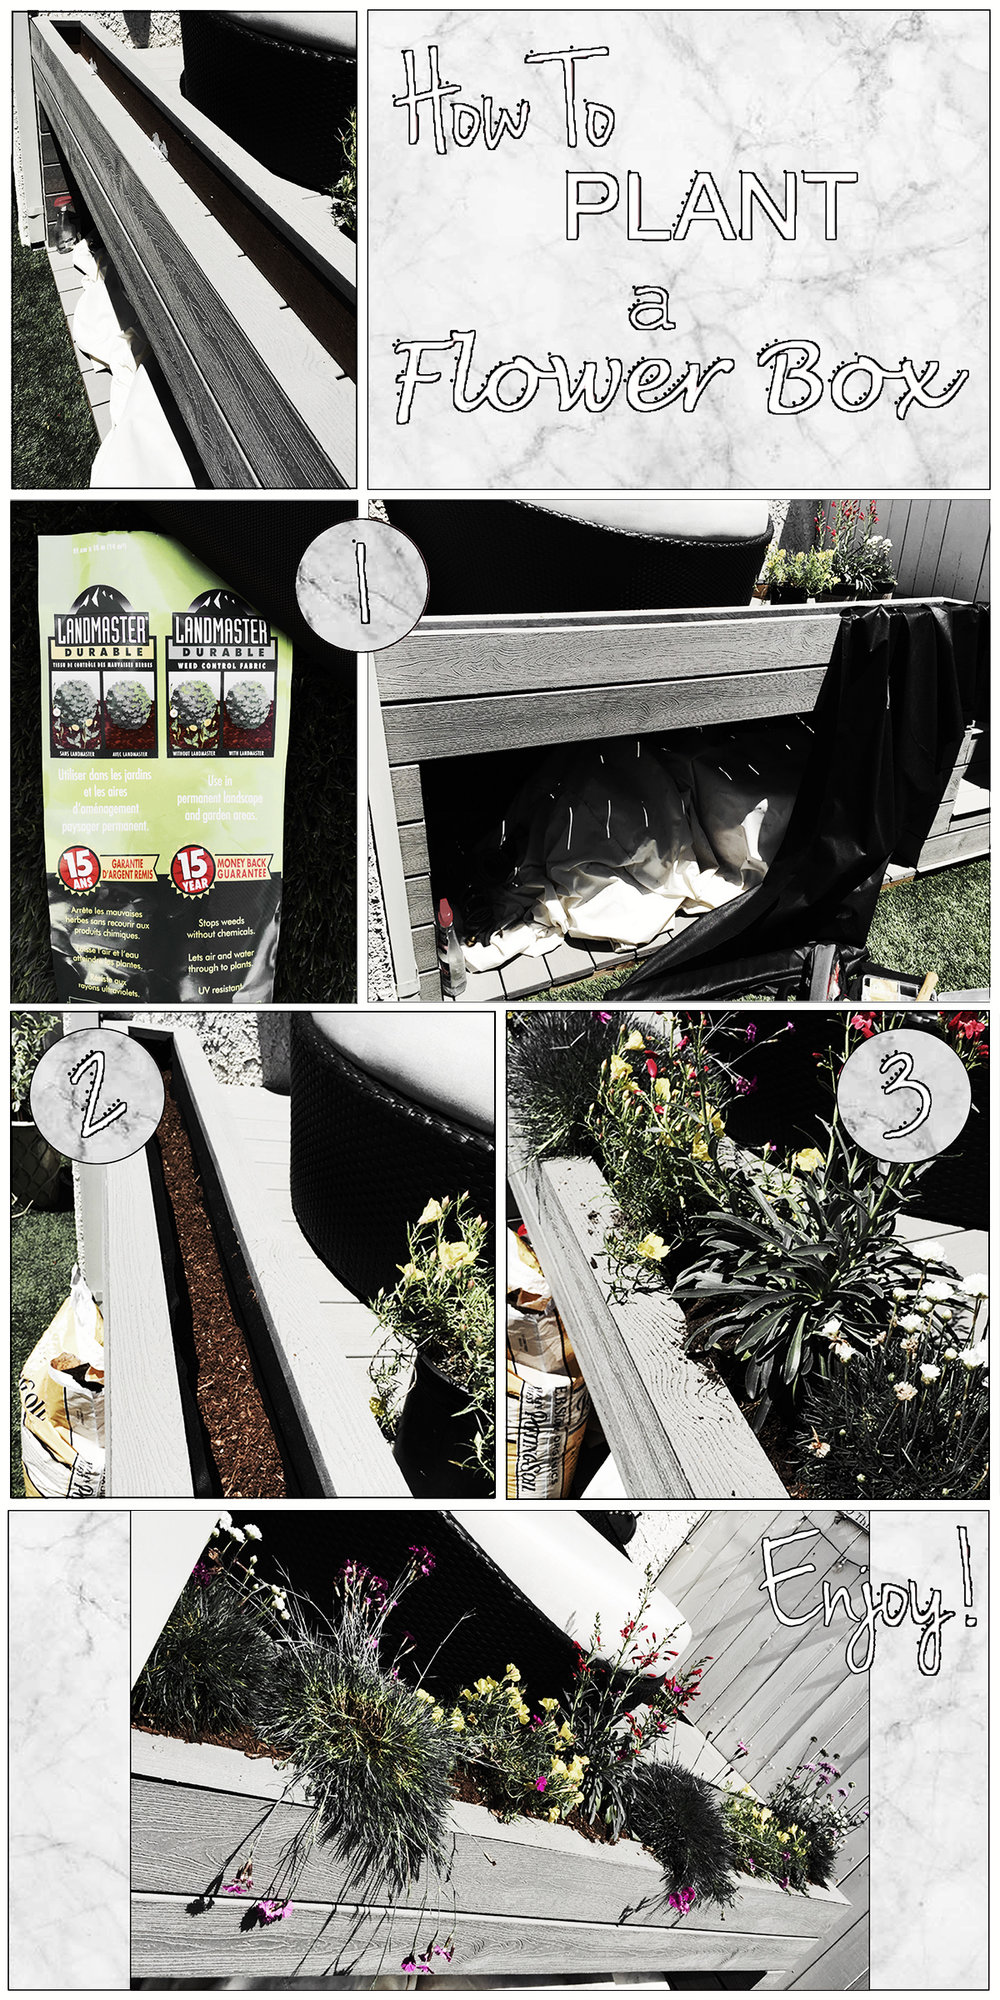 content_MONICA_RICHARDS_DIY_FLOWER_BOX_ECOBABE.jpg